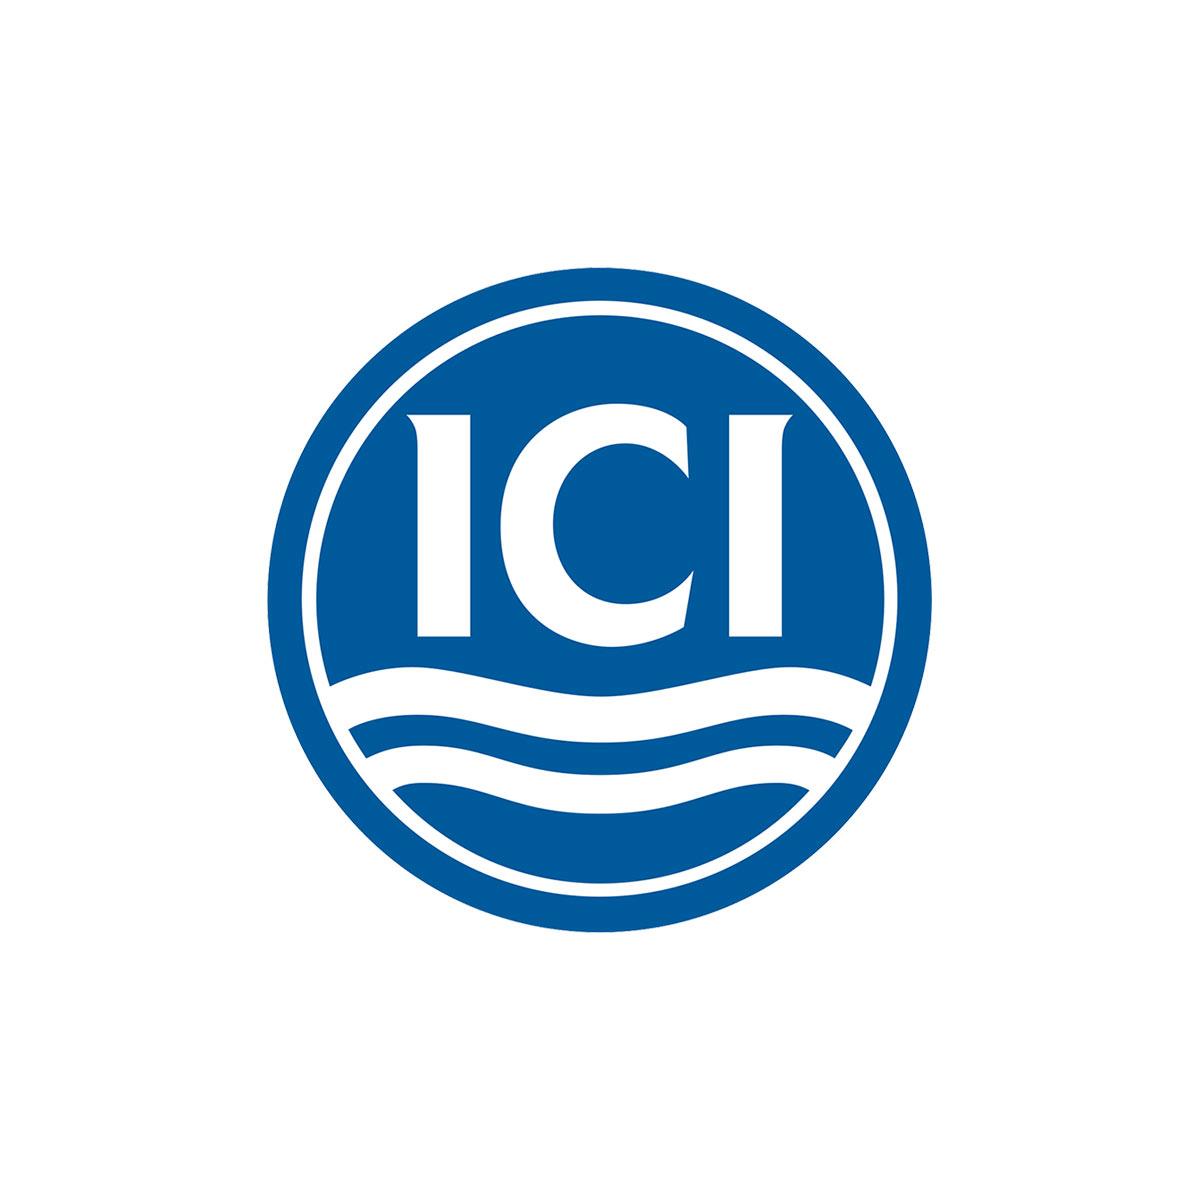 ICI logo, Design Research Unit